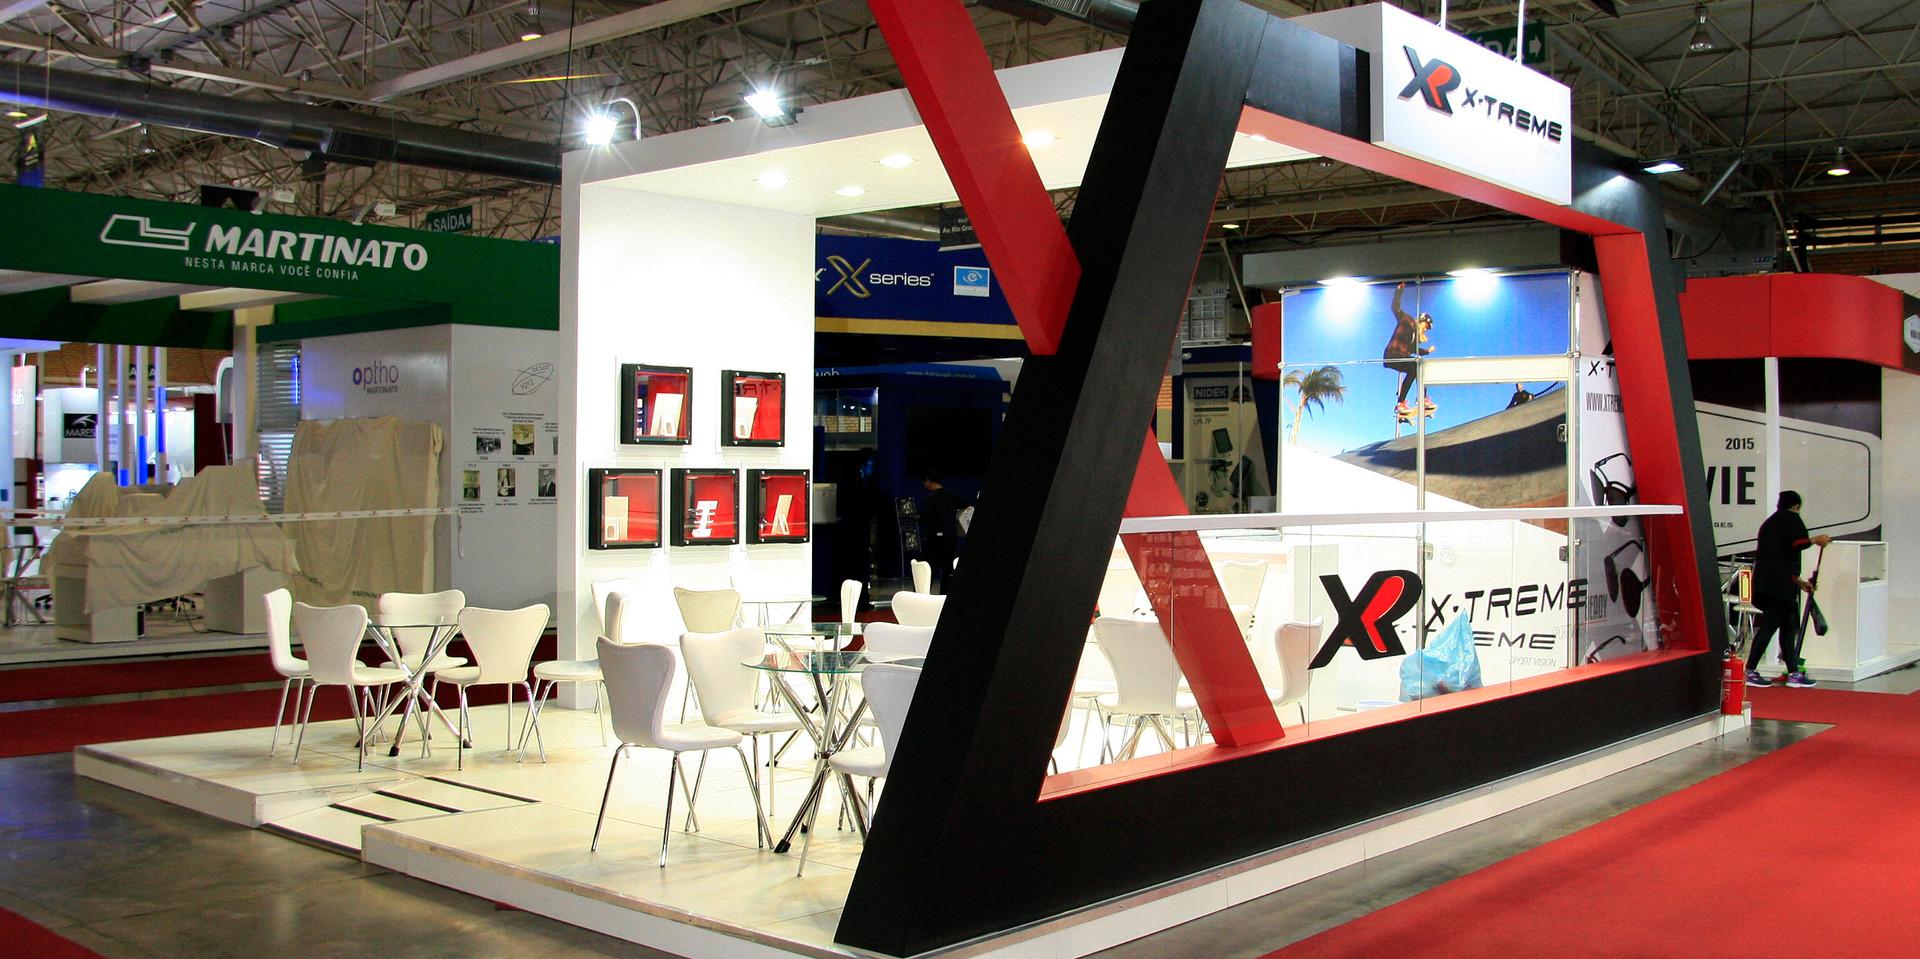 Xtreme (7).JPG